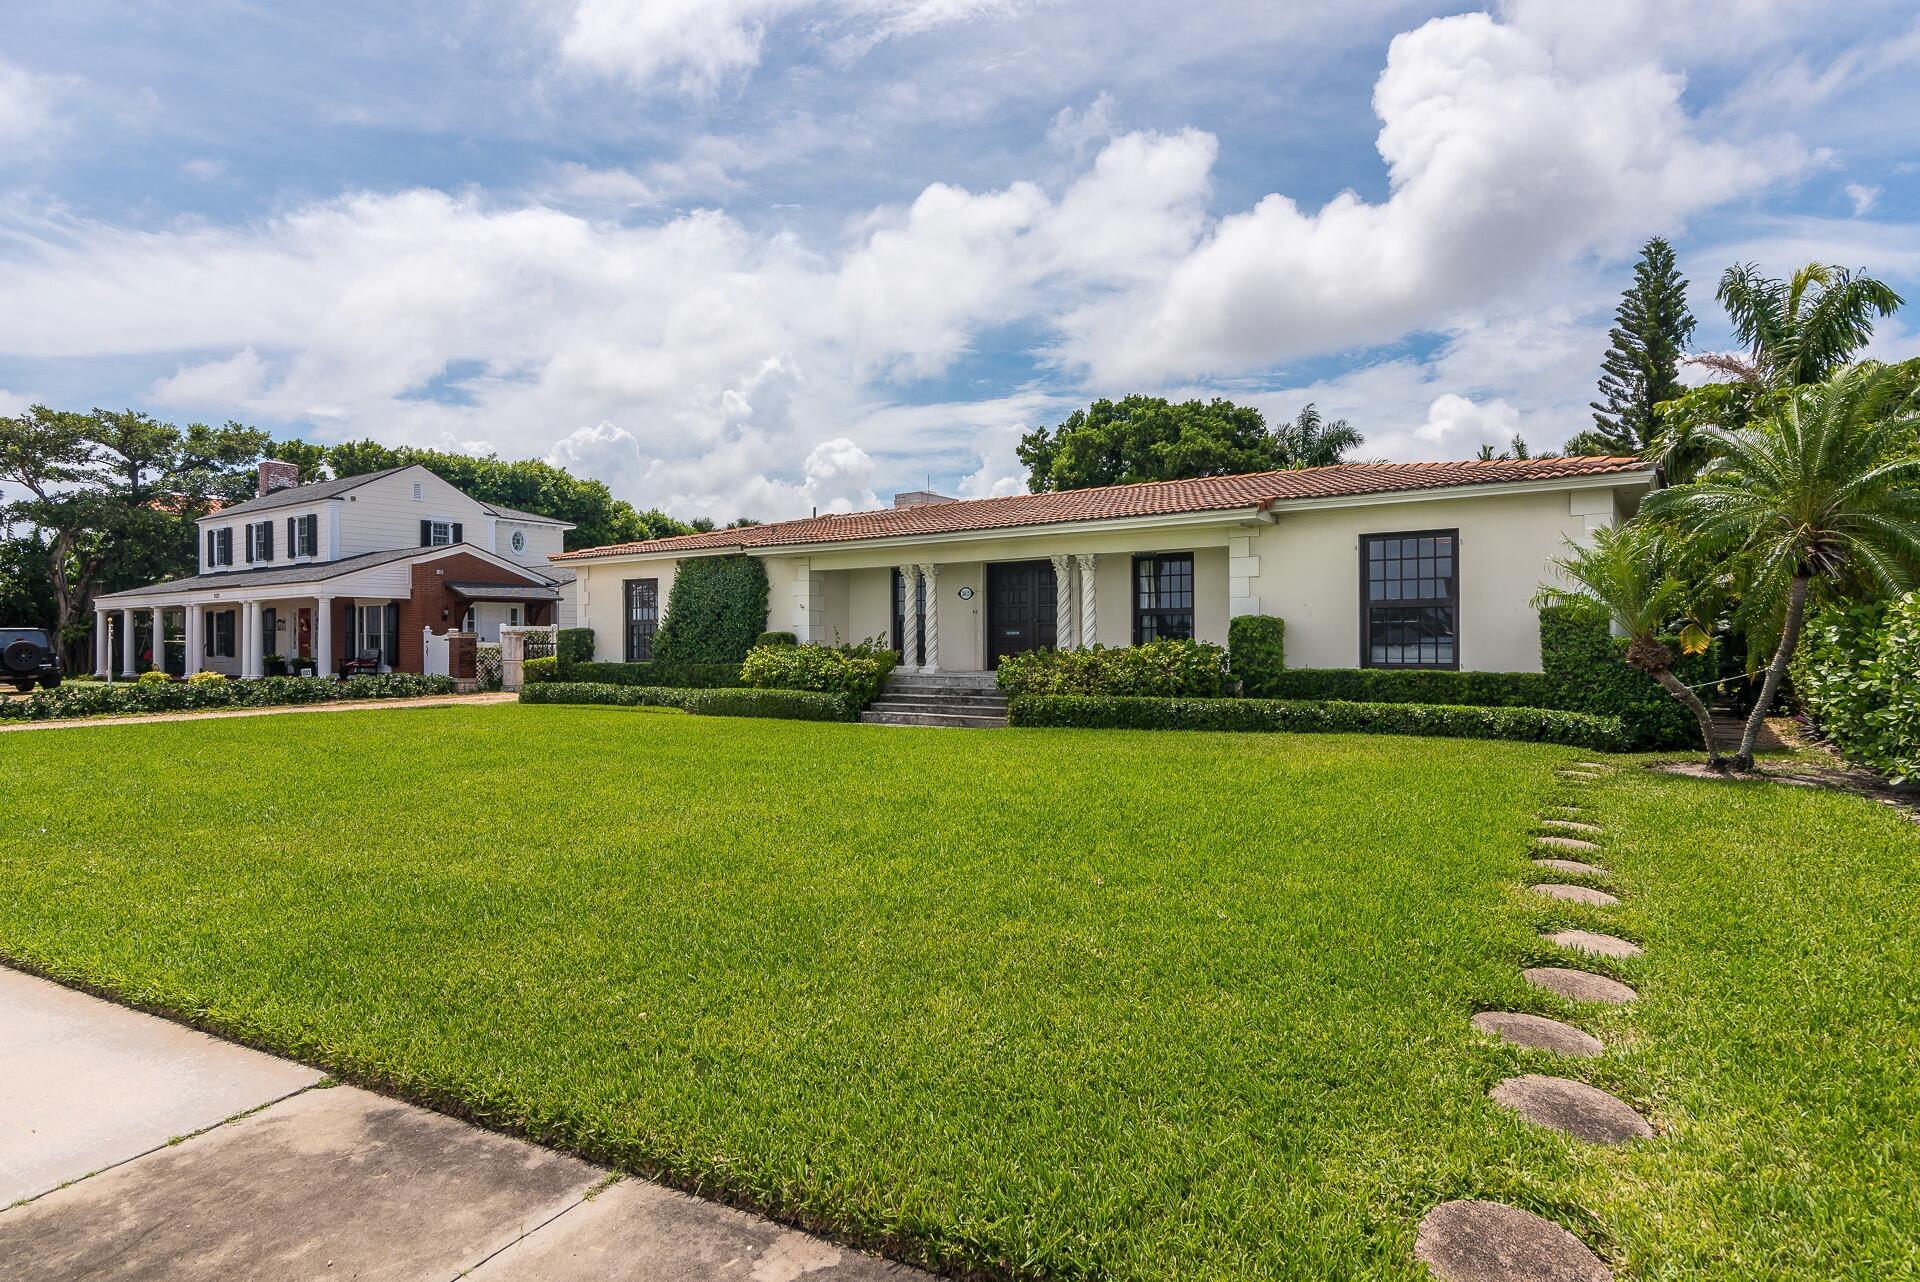 2415 S Flagler Drive, West Palm Beach, FL 33401